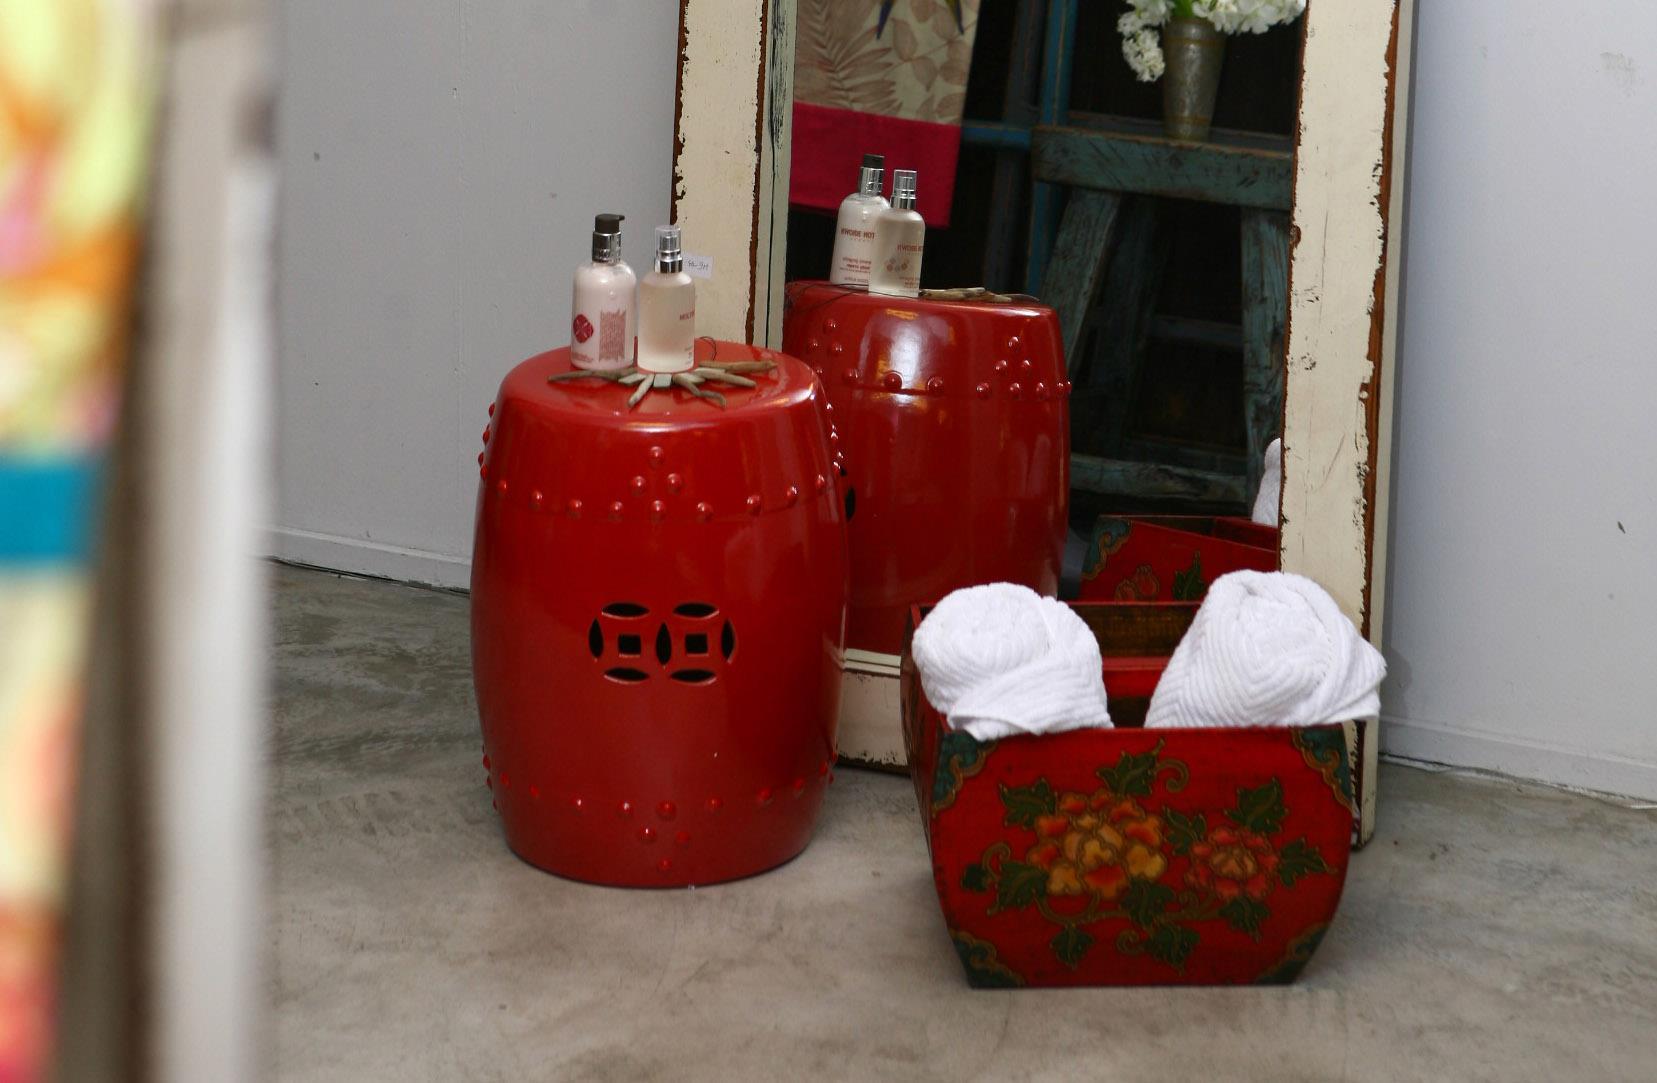 Ceramic Stool Red, Rice Measurement